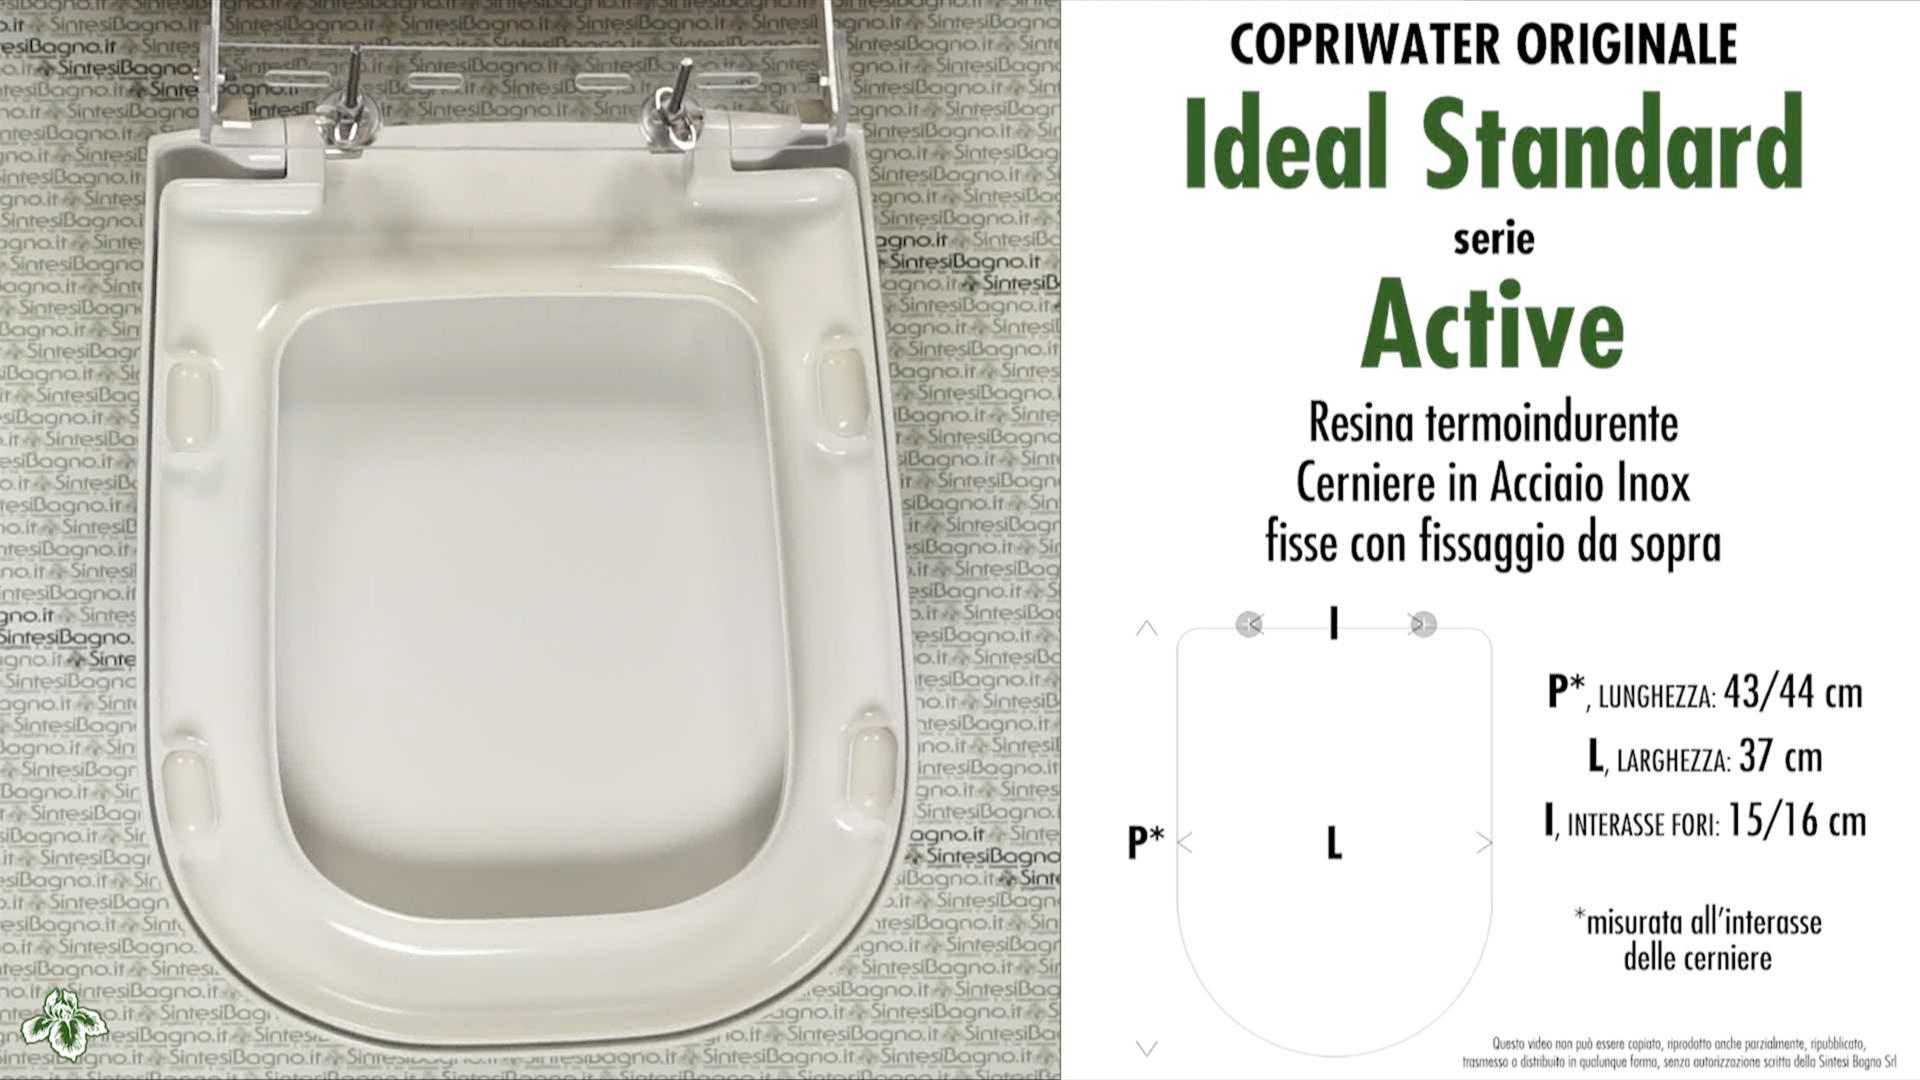 SCHEDA TECNICA MISURE copriwater IDEAL STANDARD ACTIVE